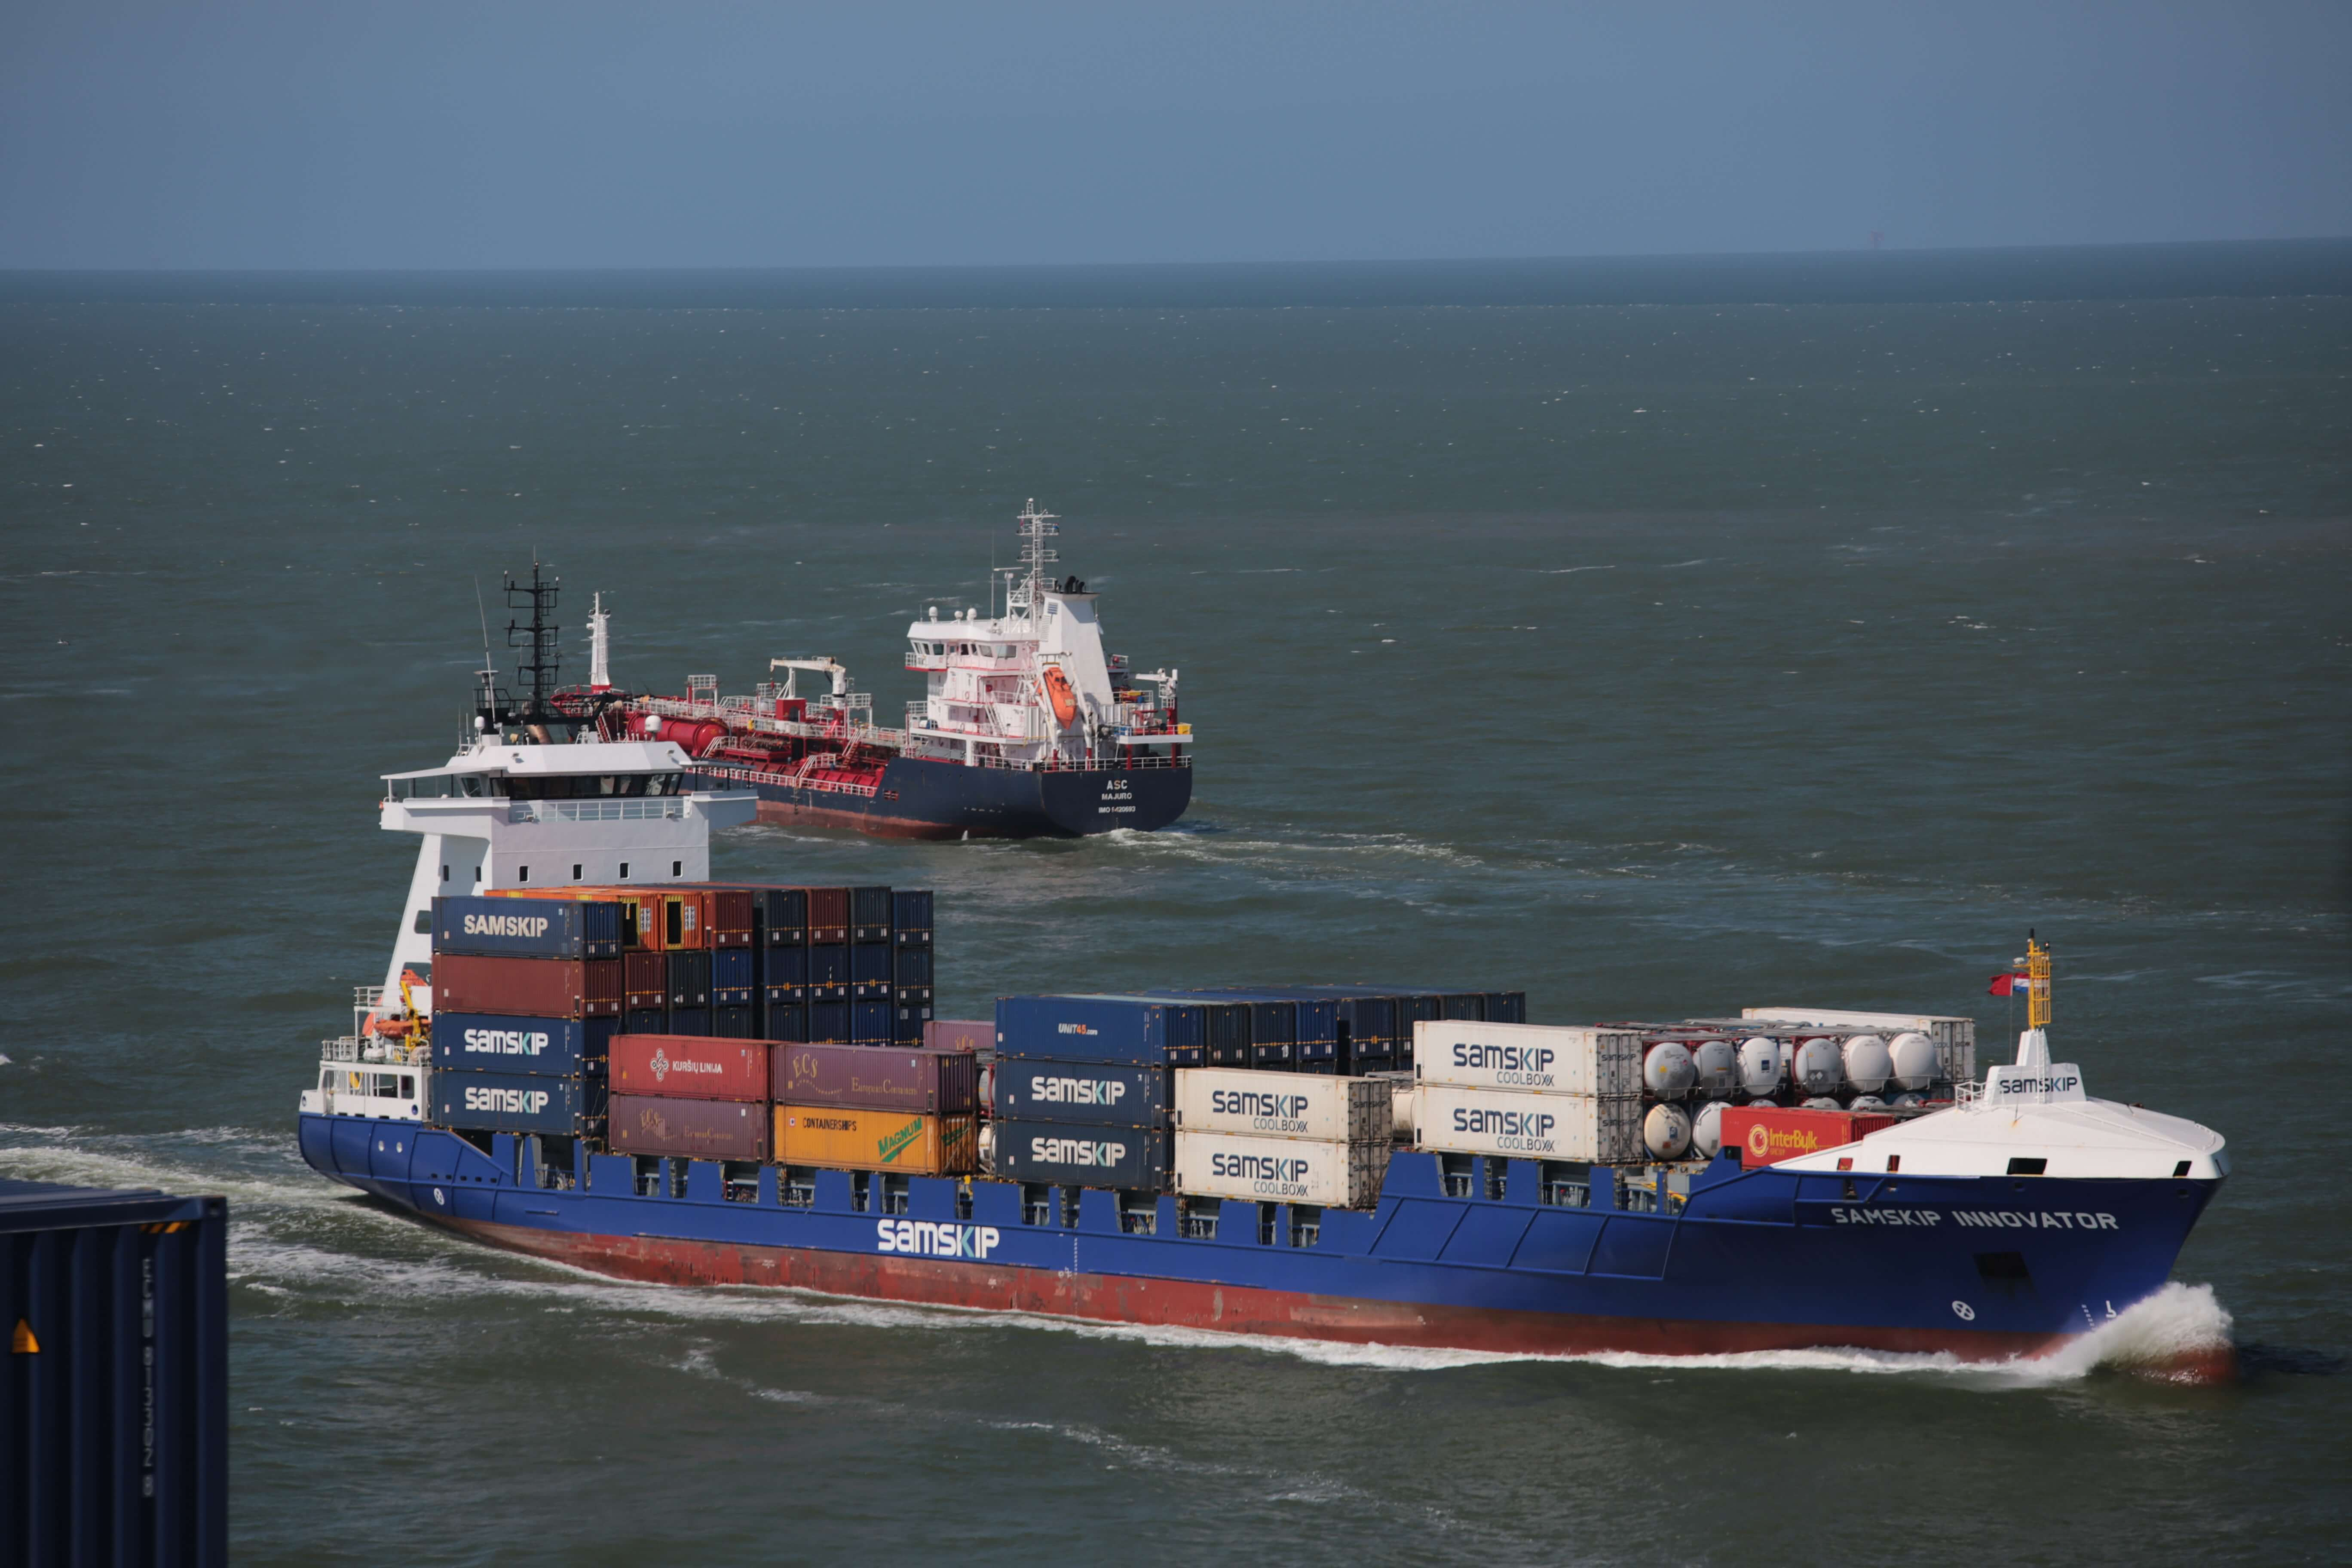 samskip container ship